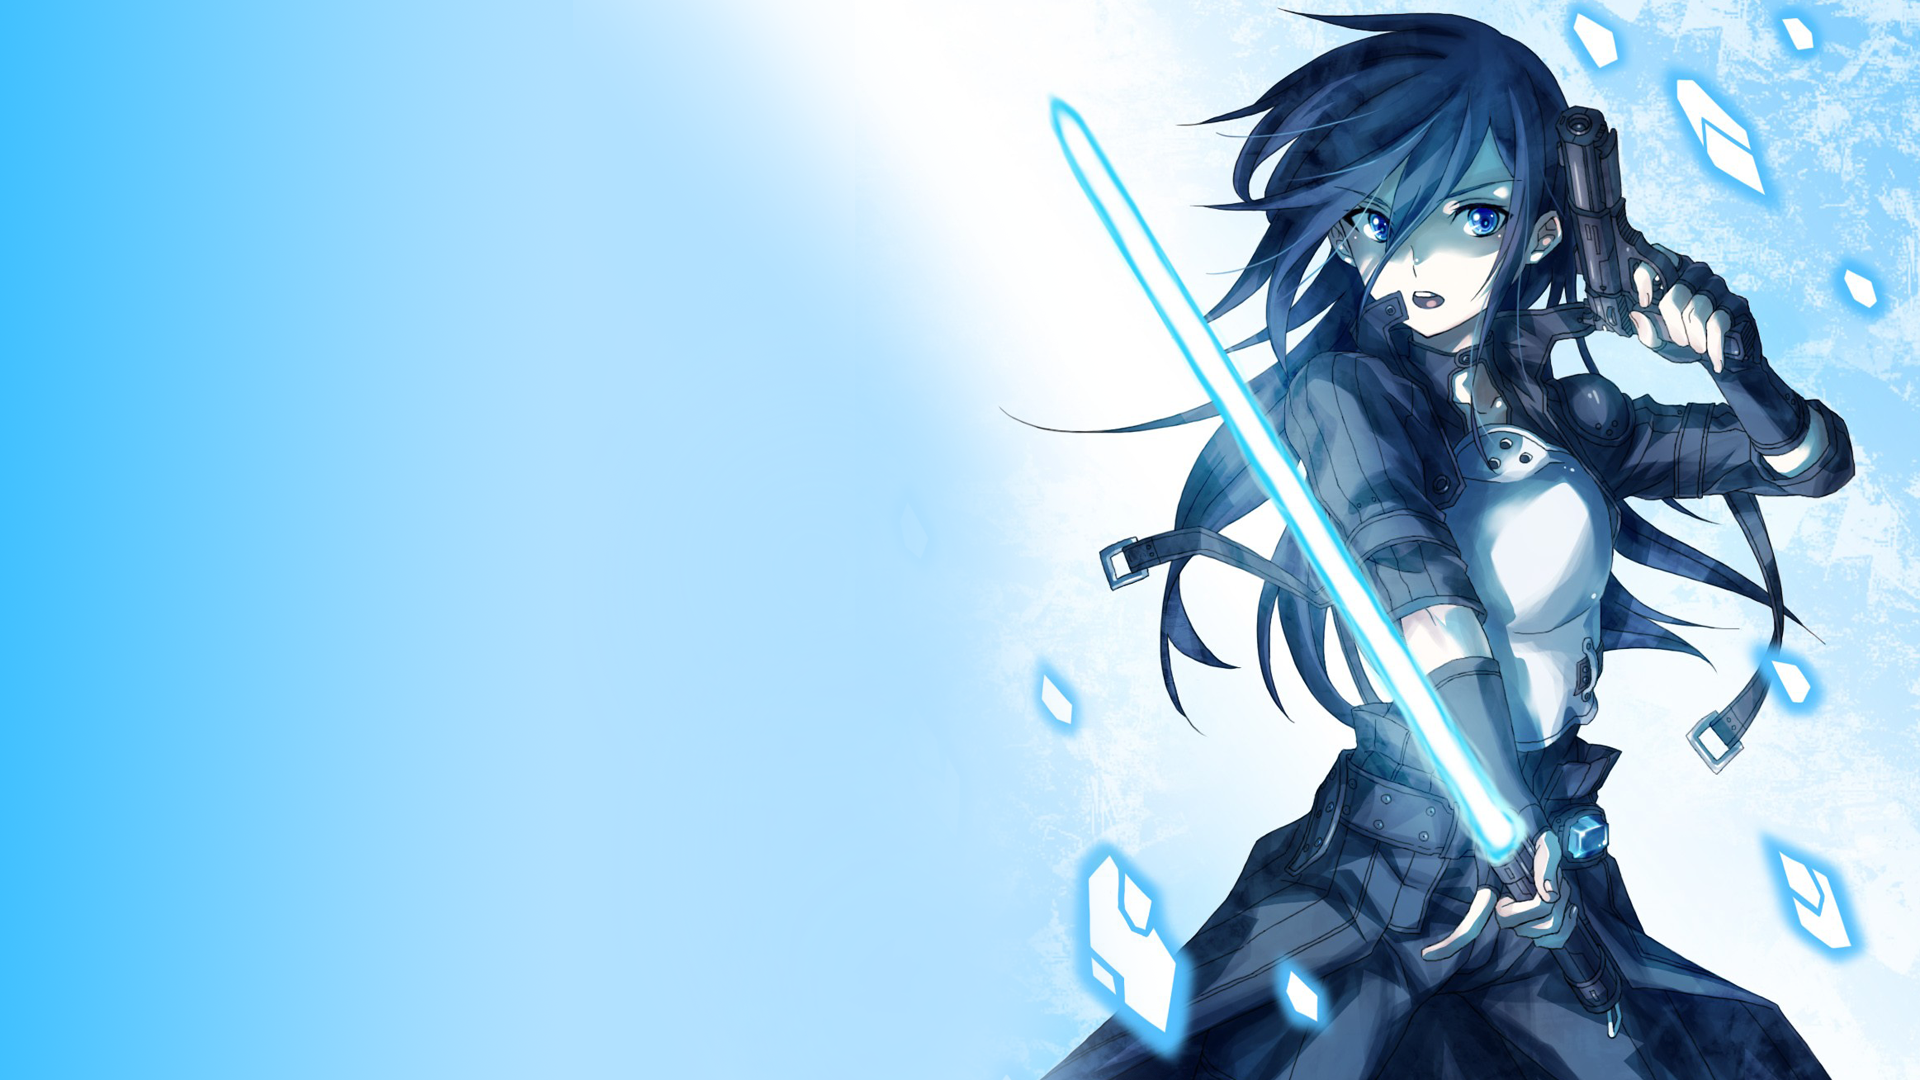 Sword art online kirigaya kazuto kirito photon sword gun gale online